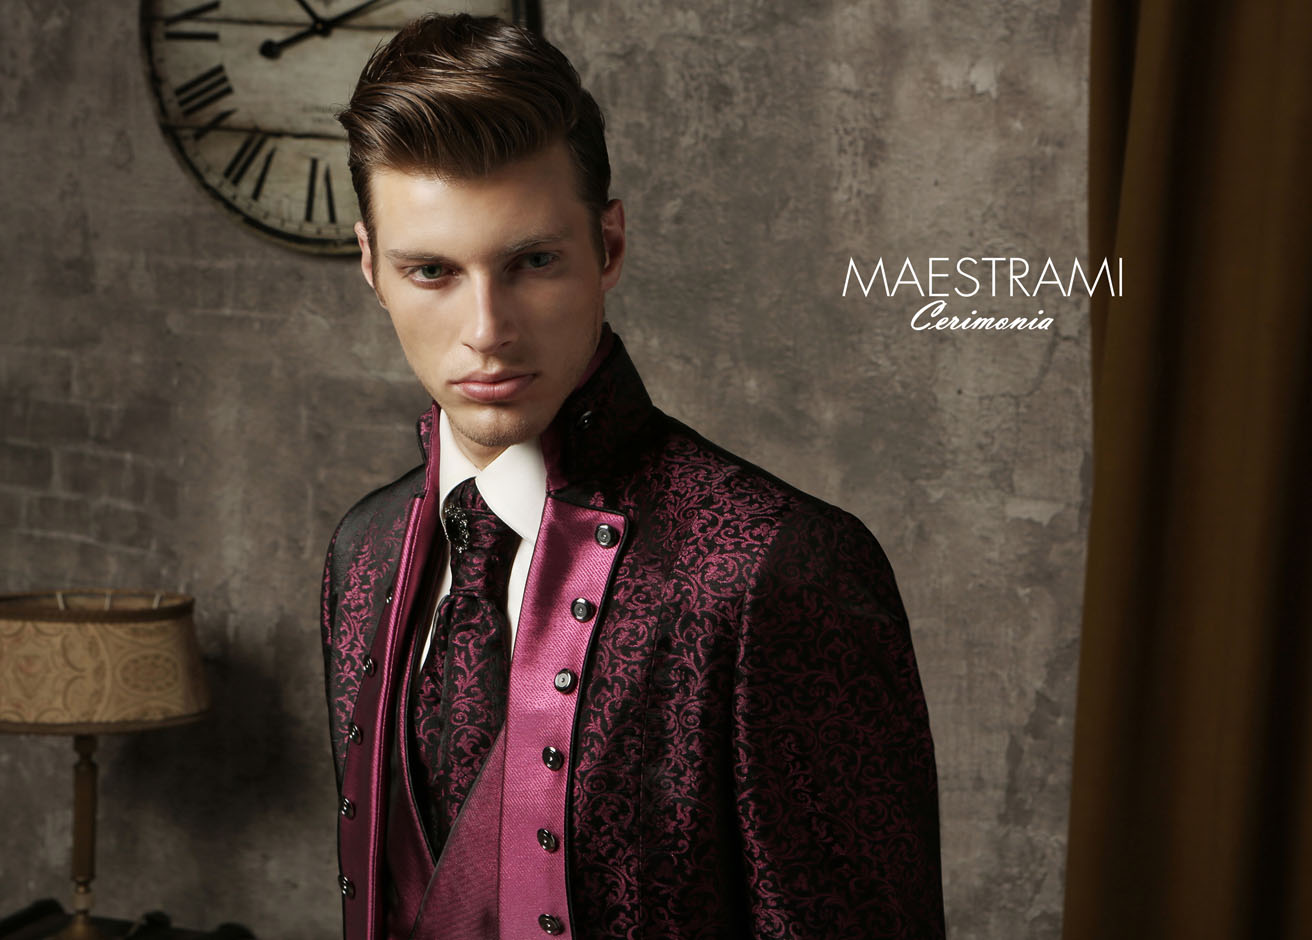 Atelier Look Sposa vestito sposo 2016 bourdeaux MC108 MC126 Maestrami Cerimonia1